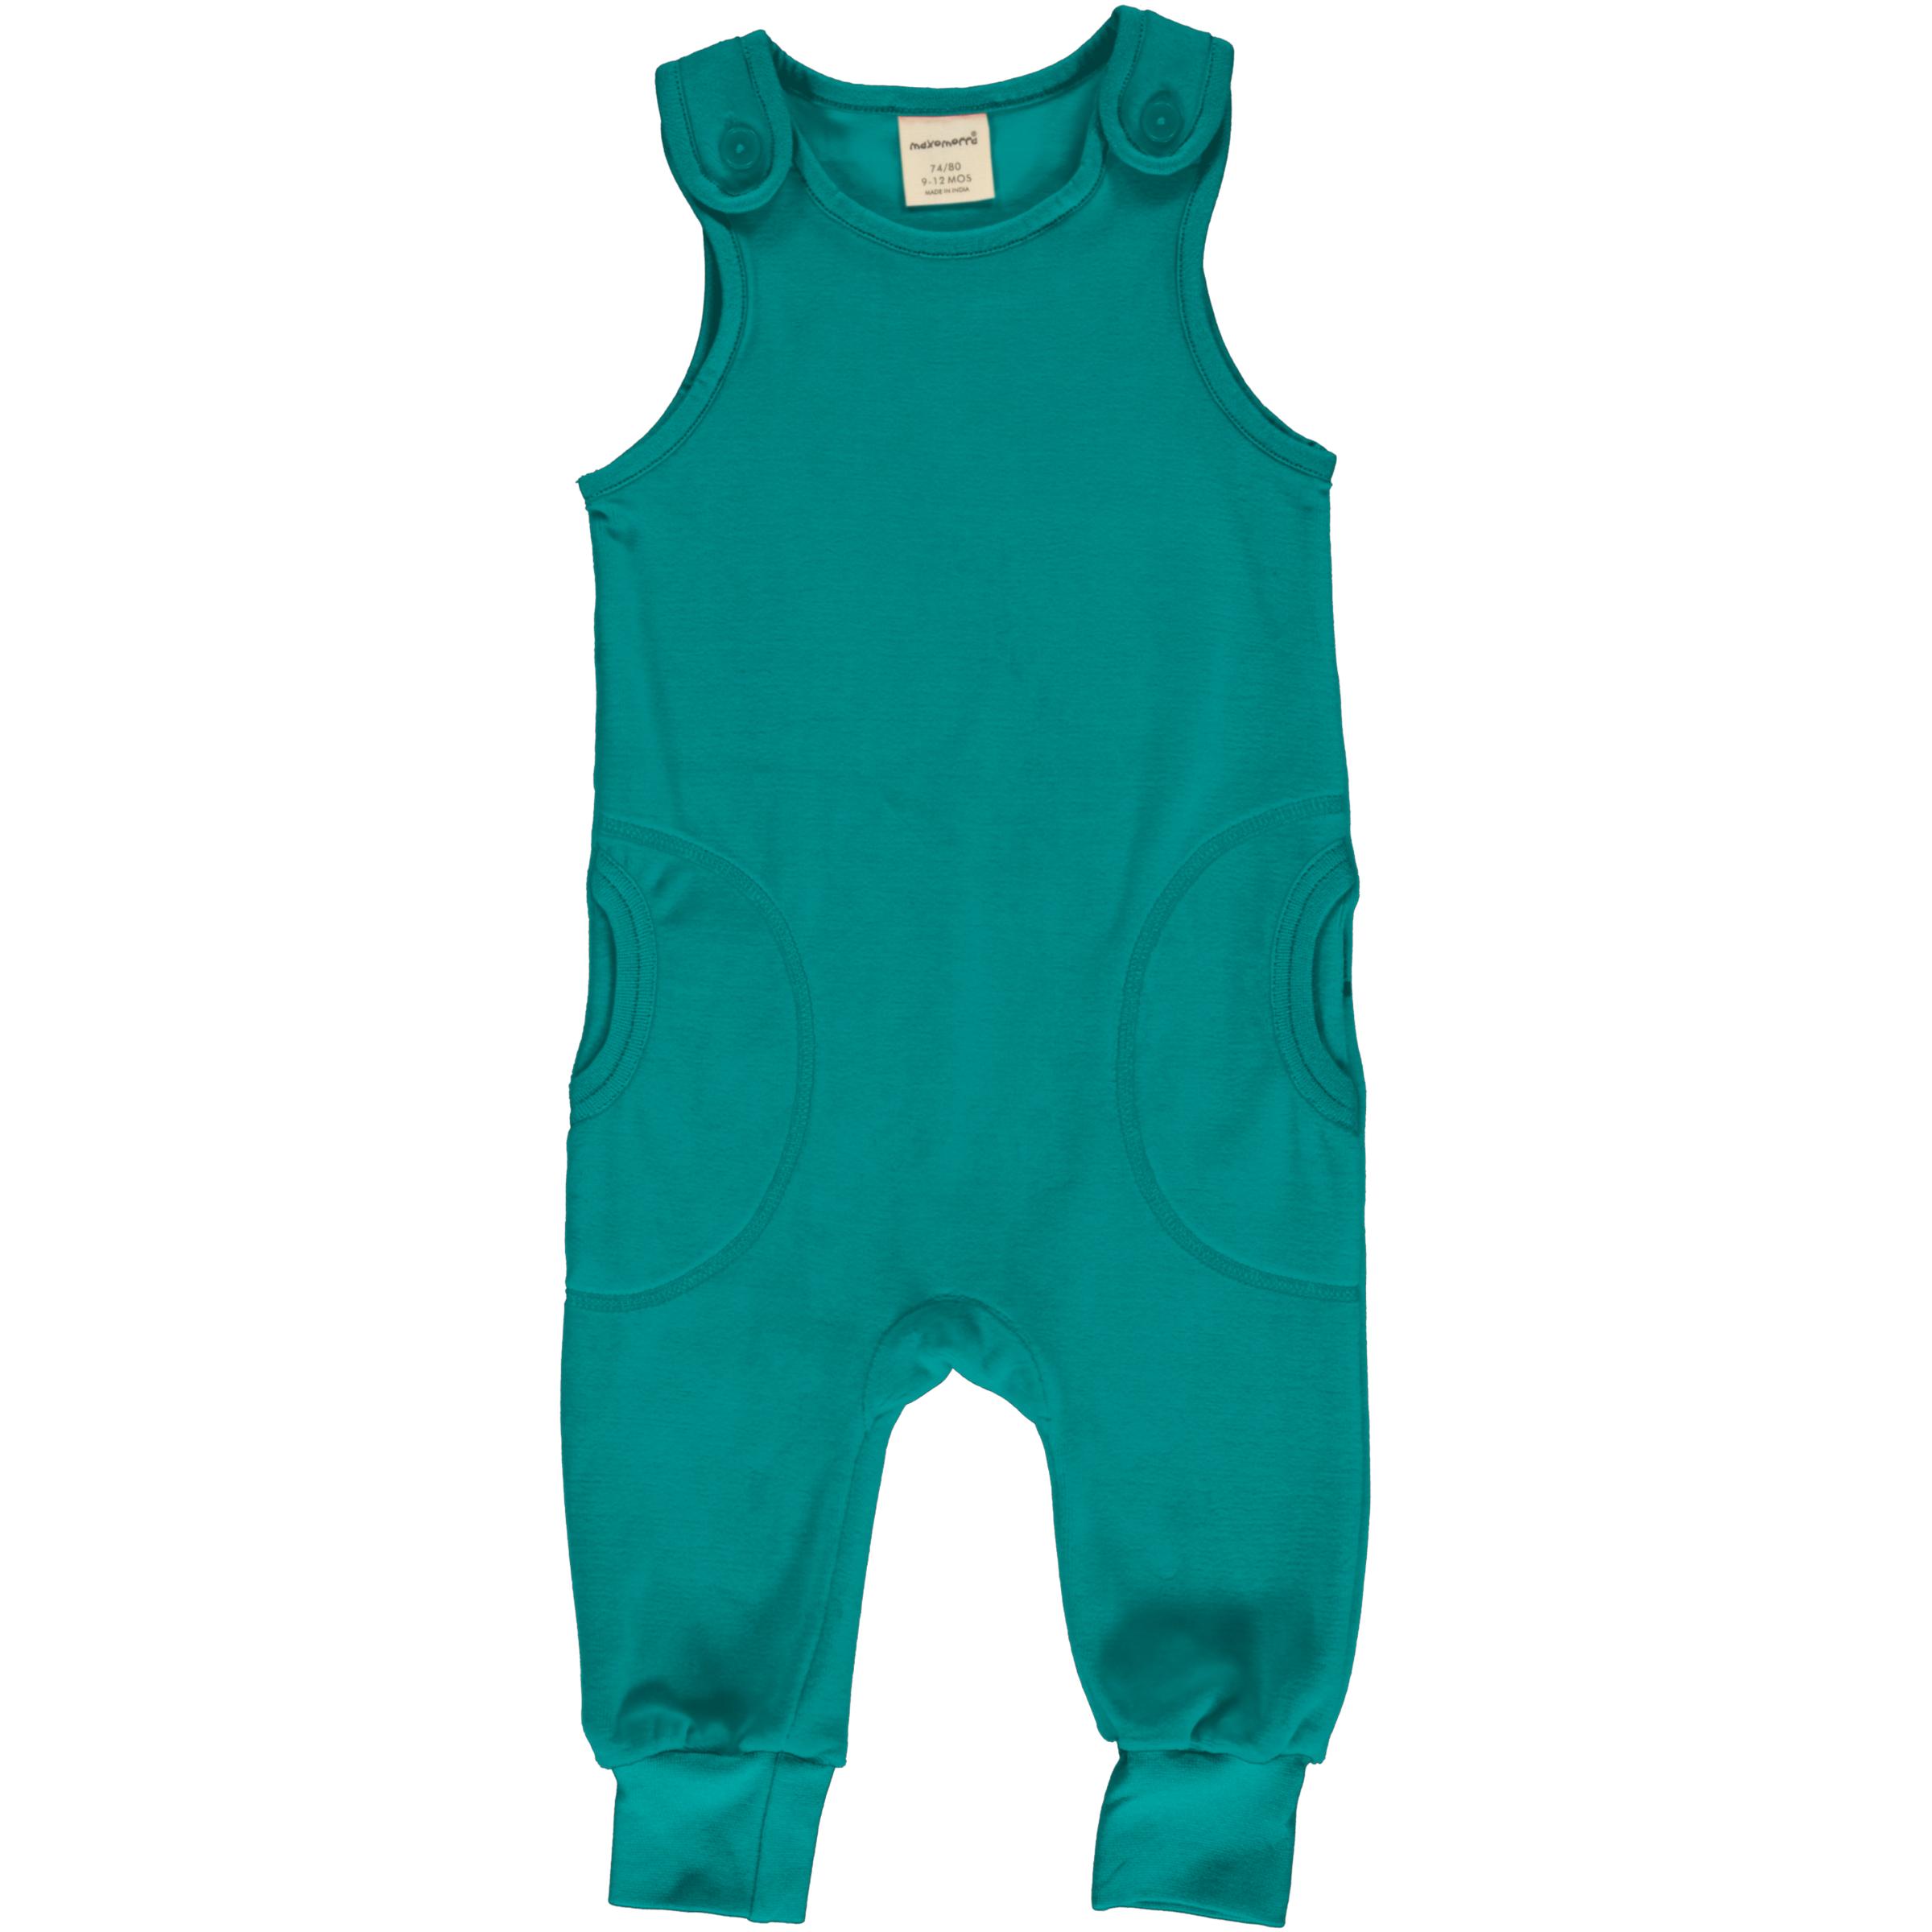 Maxomorra Baby Playsuit Velour LAGOON 086/092